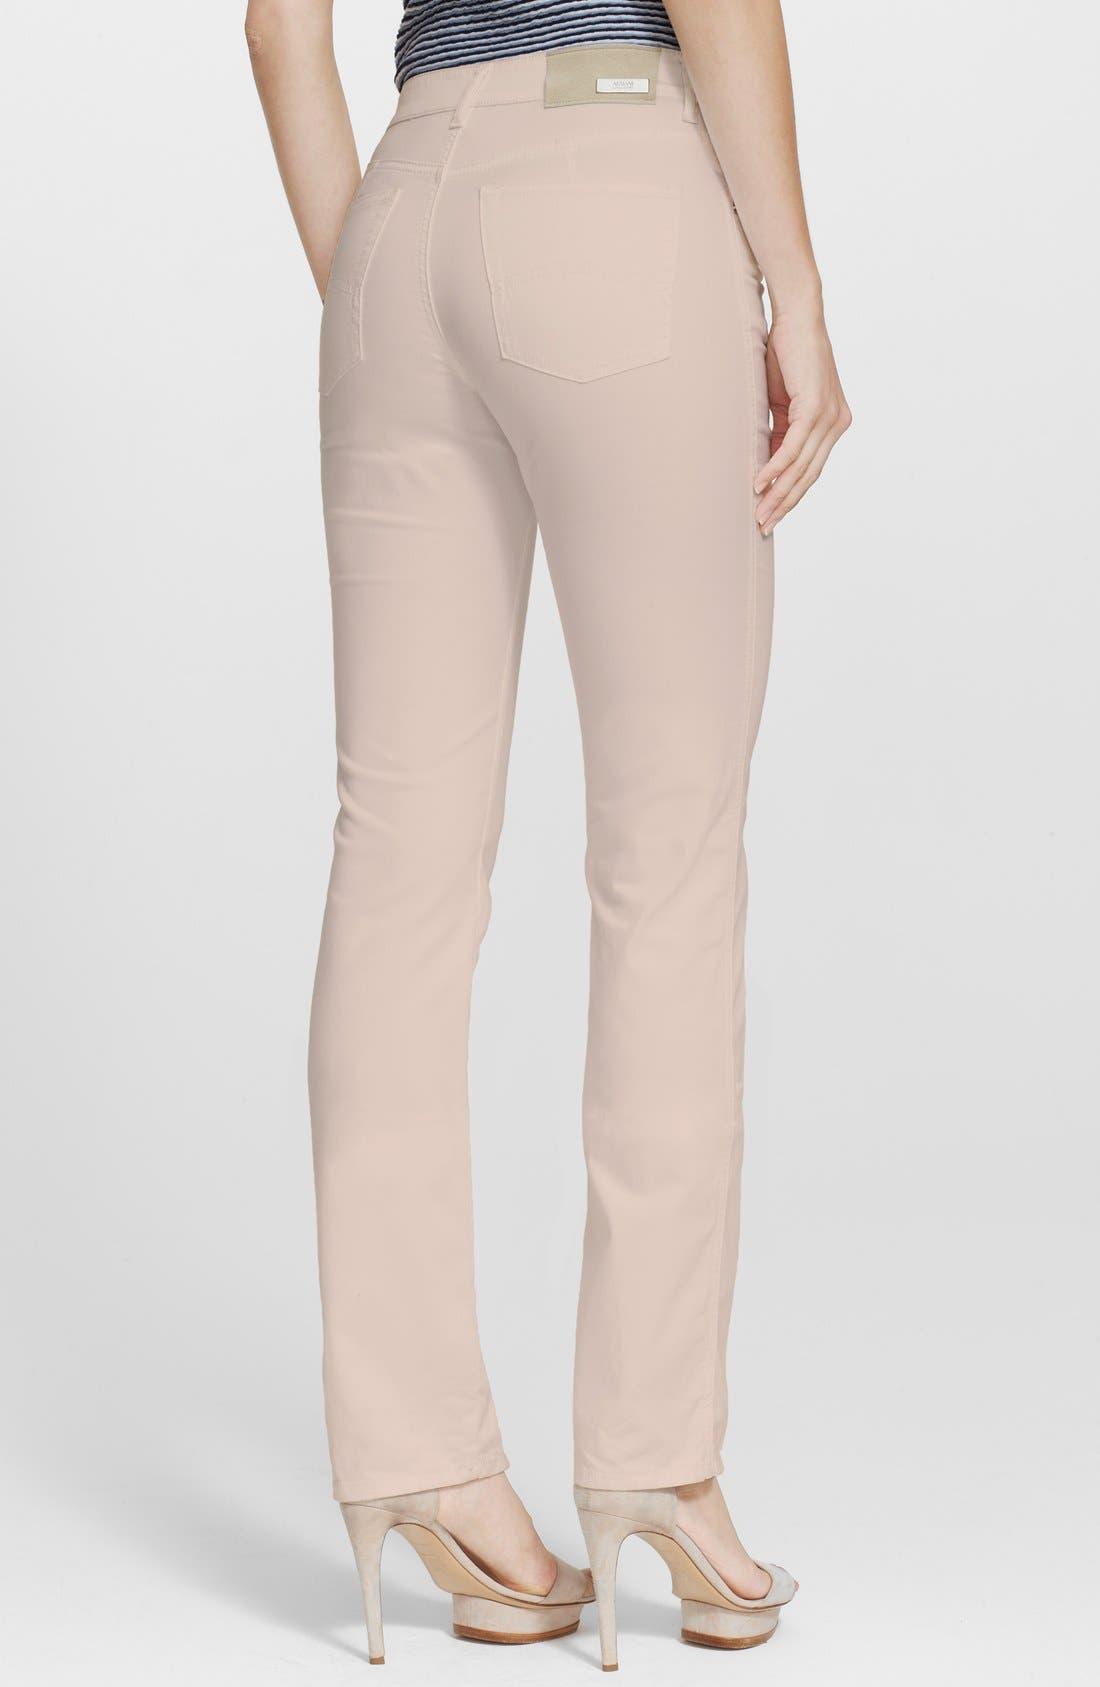 ARMANI COLLEZIONI, Slim Brushed Cotton Jeans, Alternate thumbnail 3, color, 272